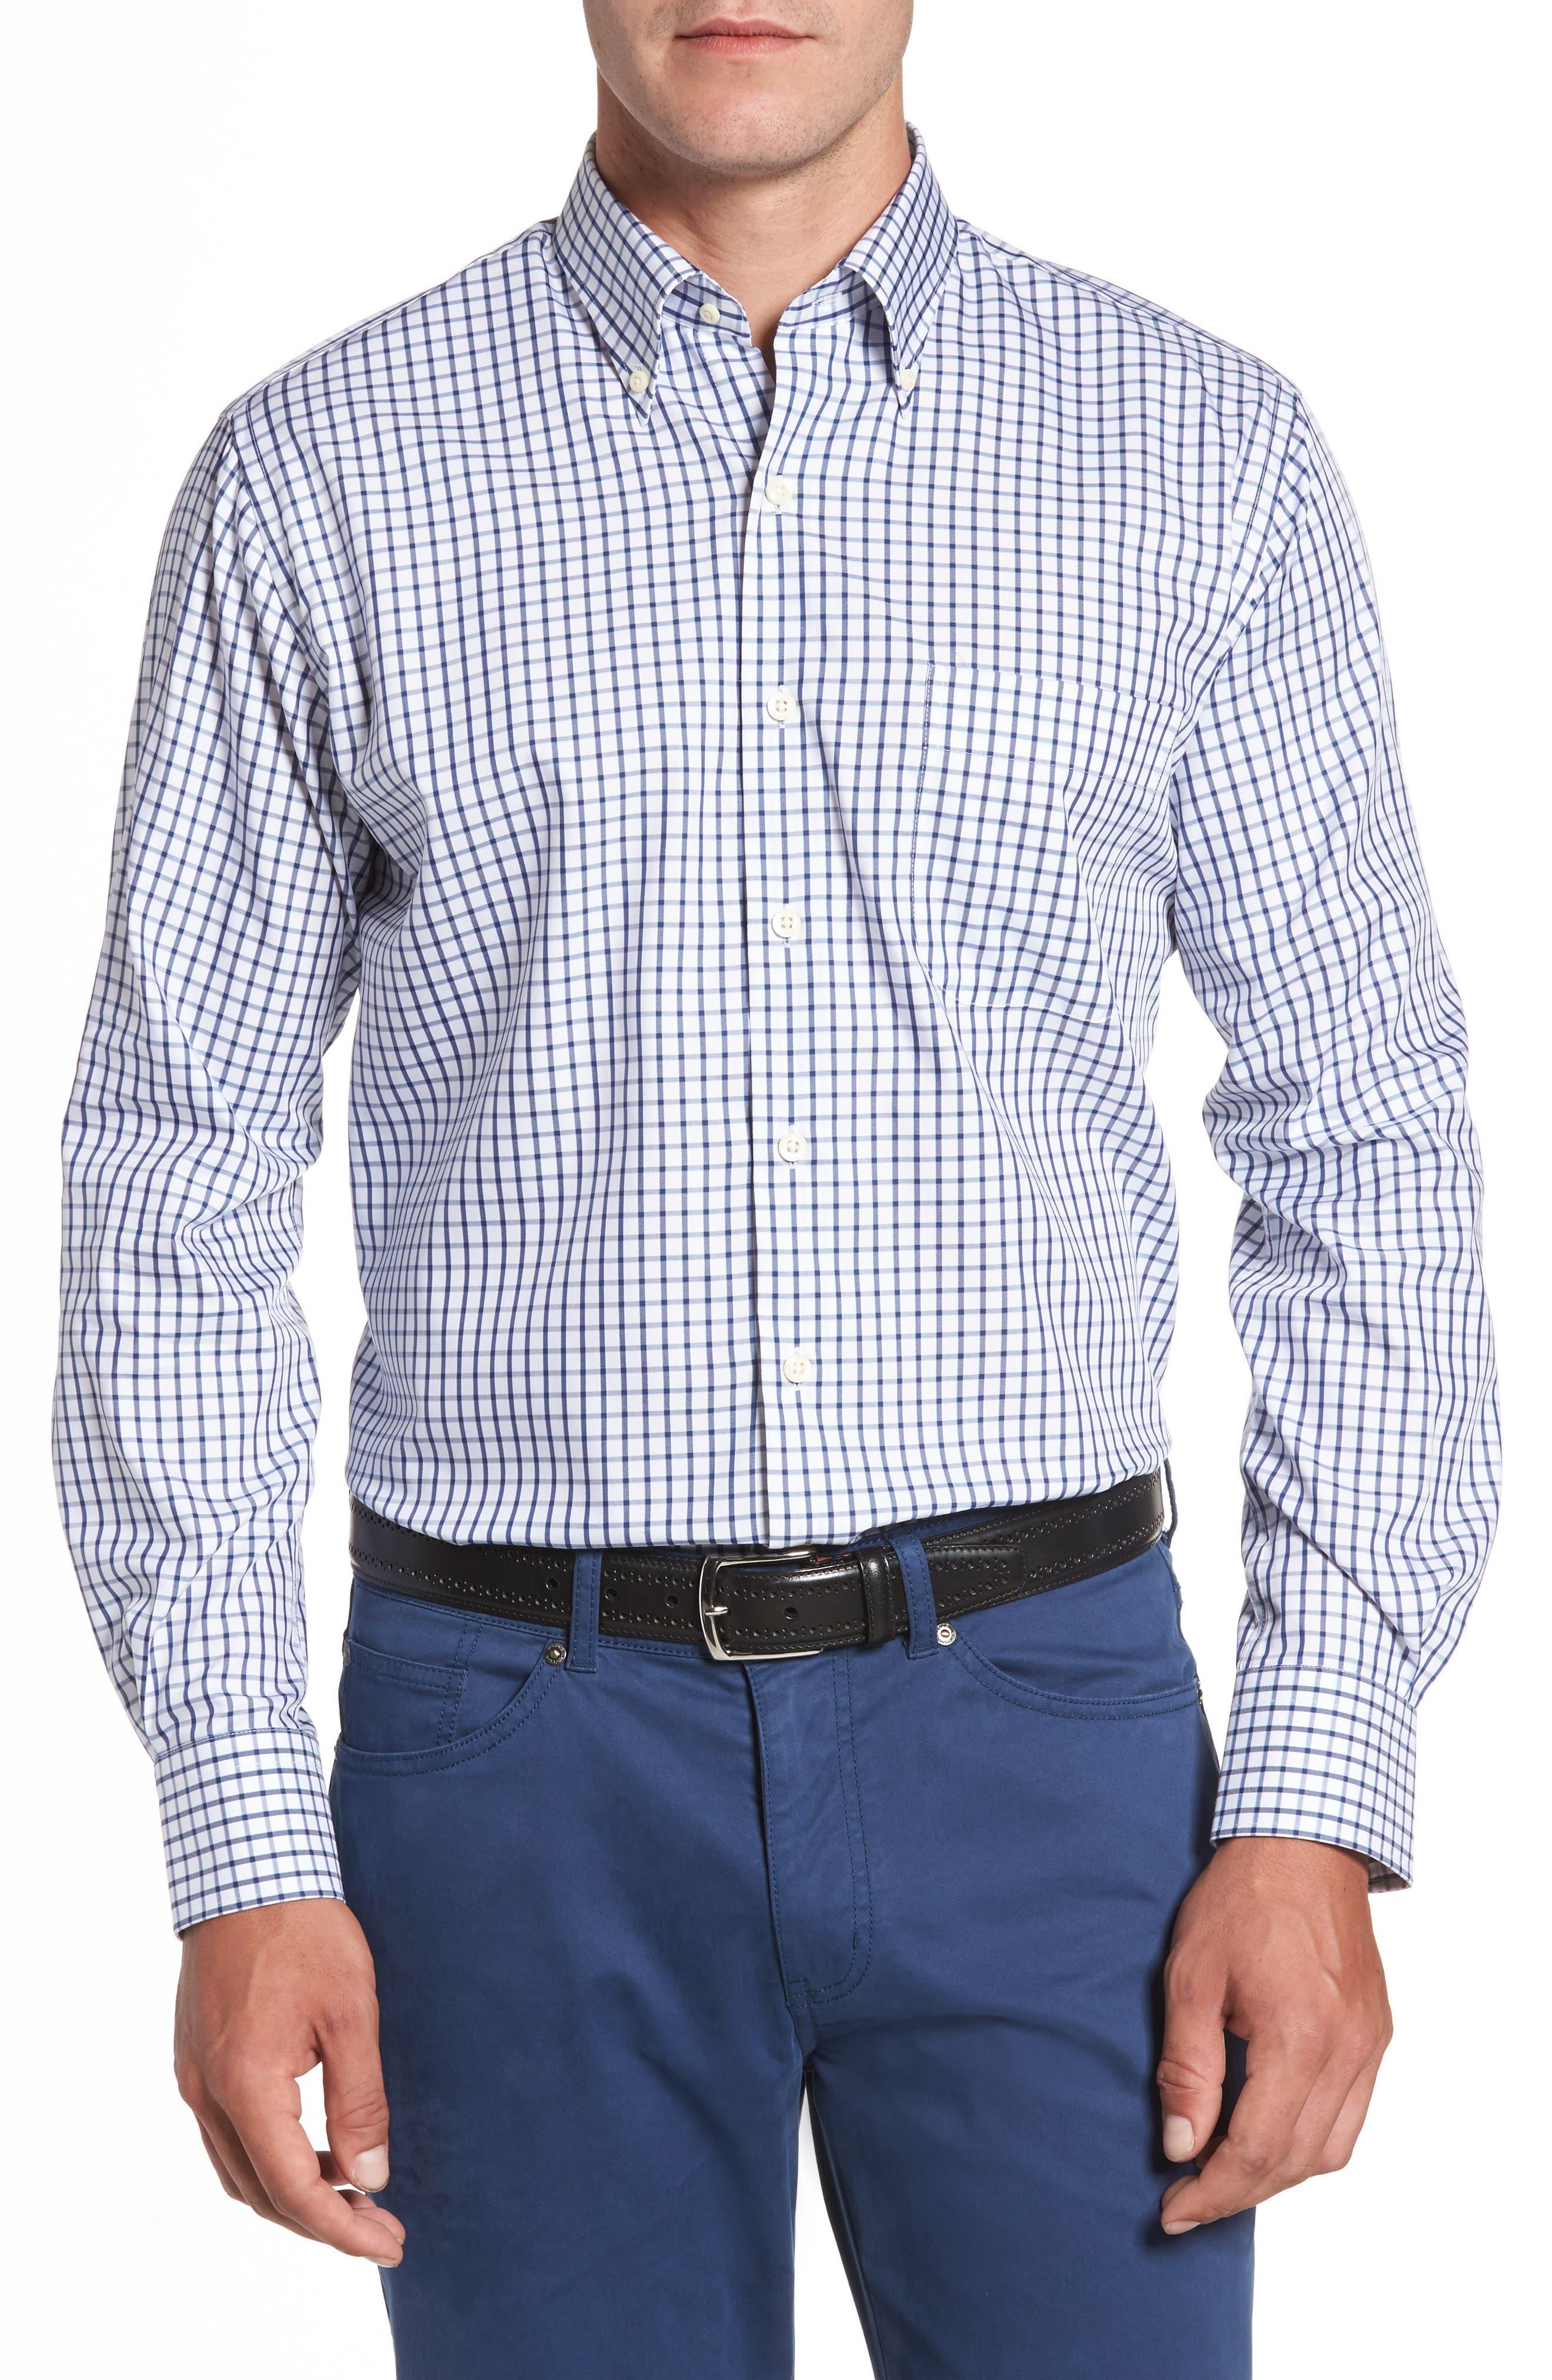 Crown Soft Nevada Tattersall Sport Shirt,                         Main,                         color, Midwinter Blue